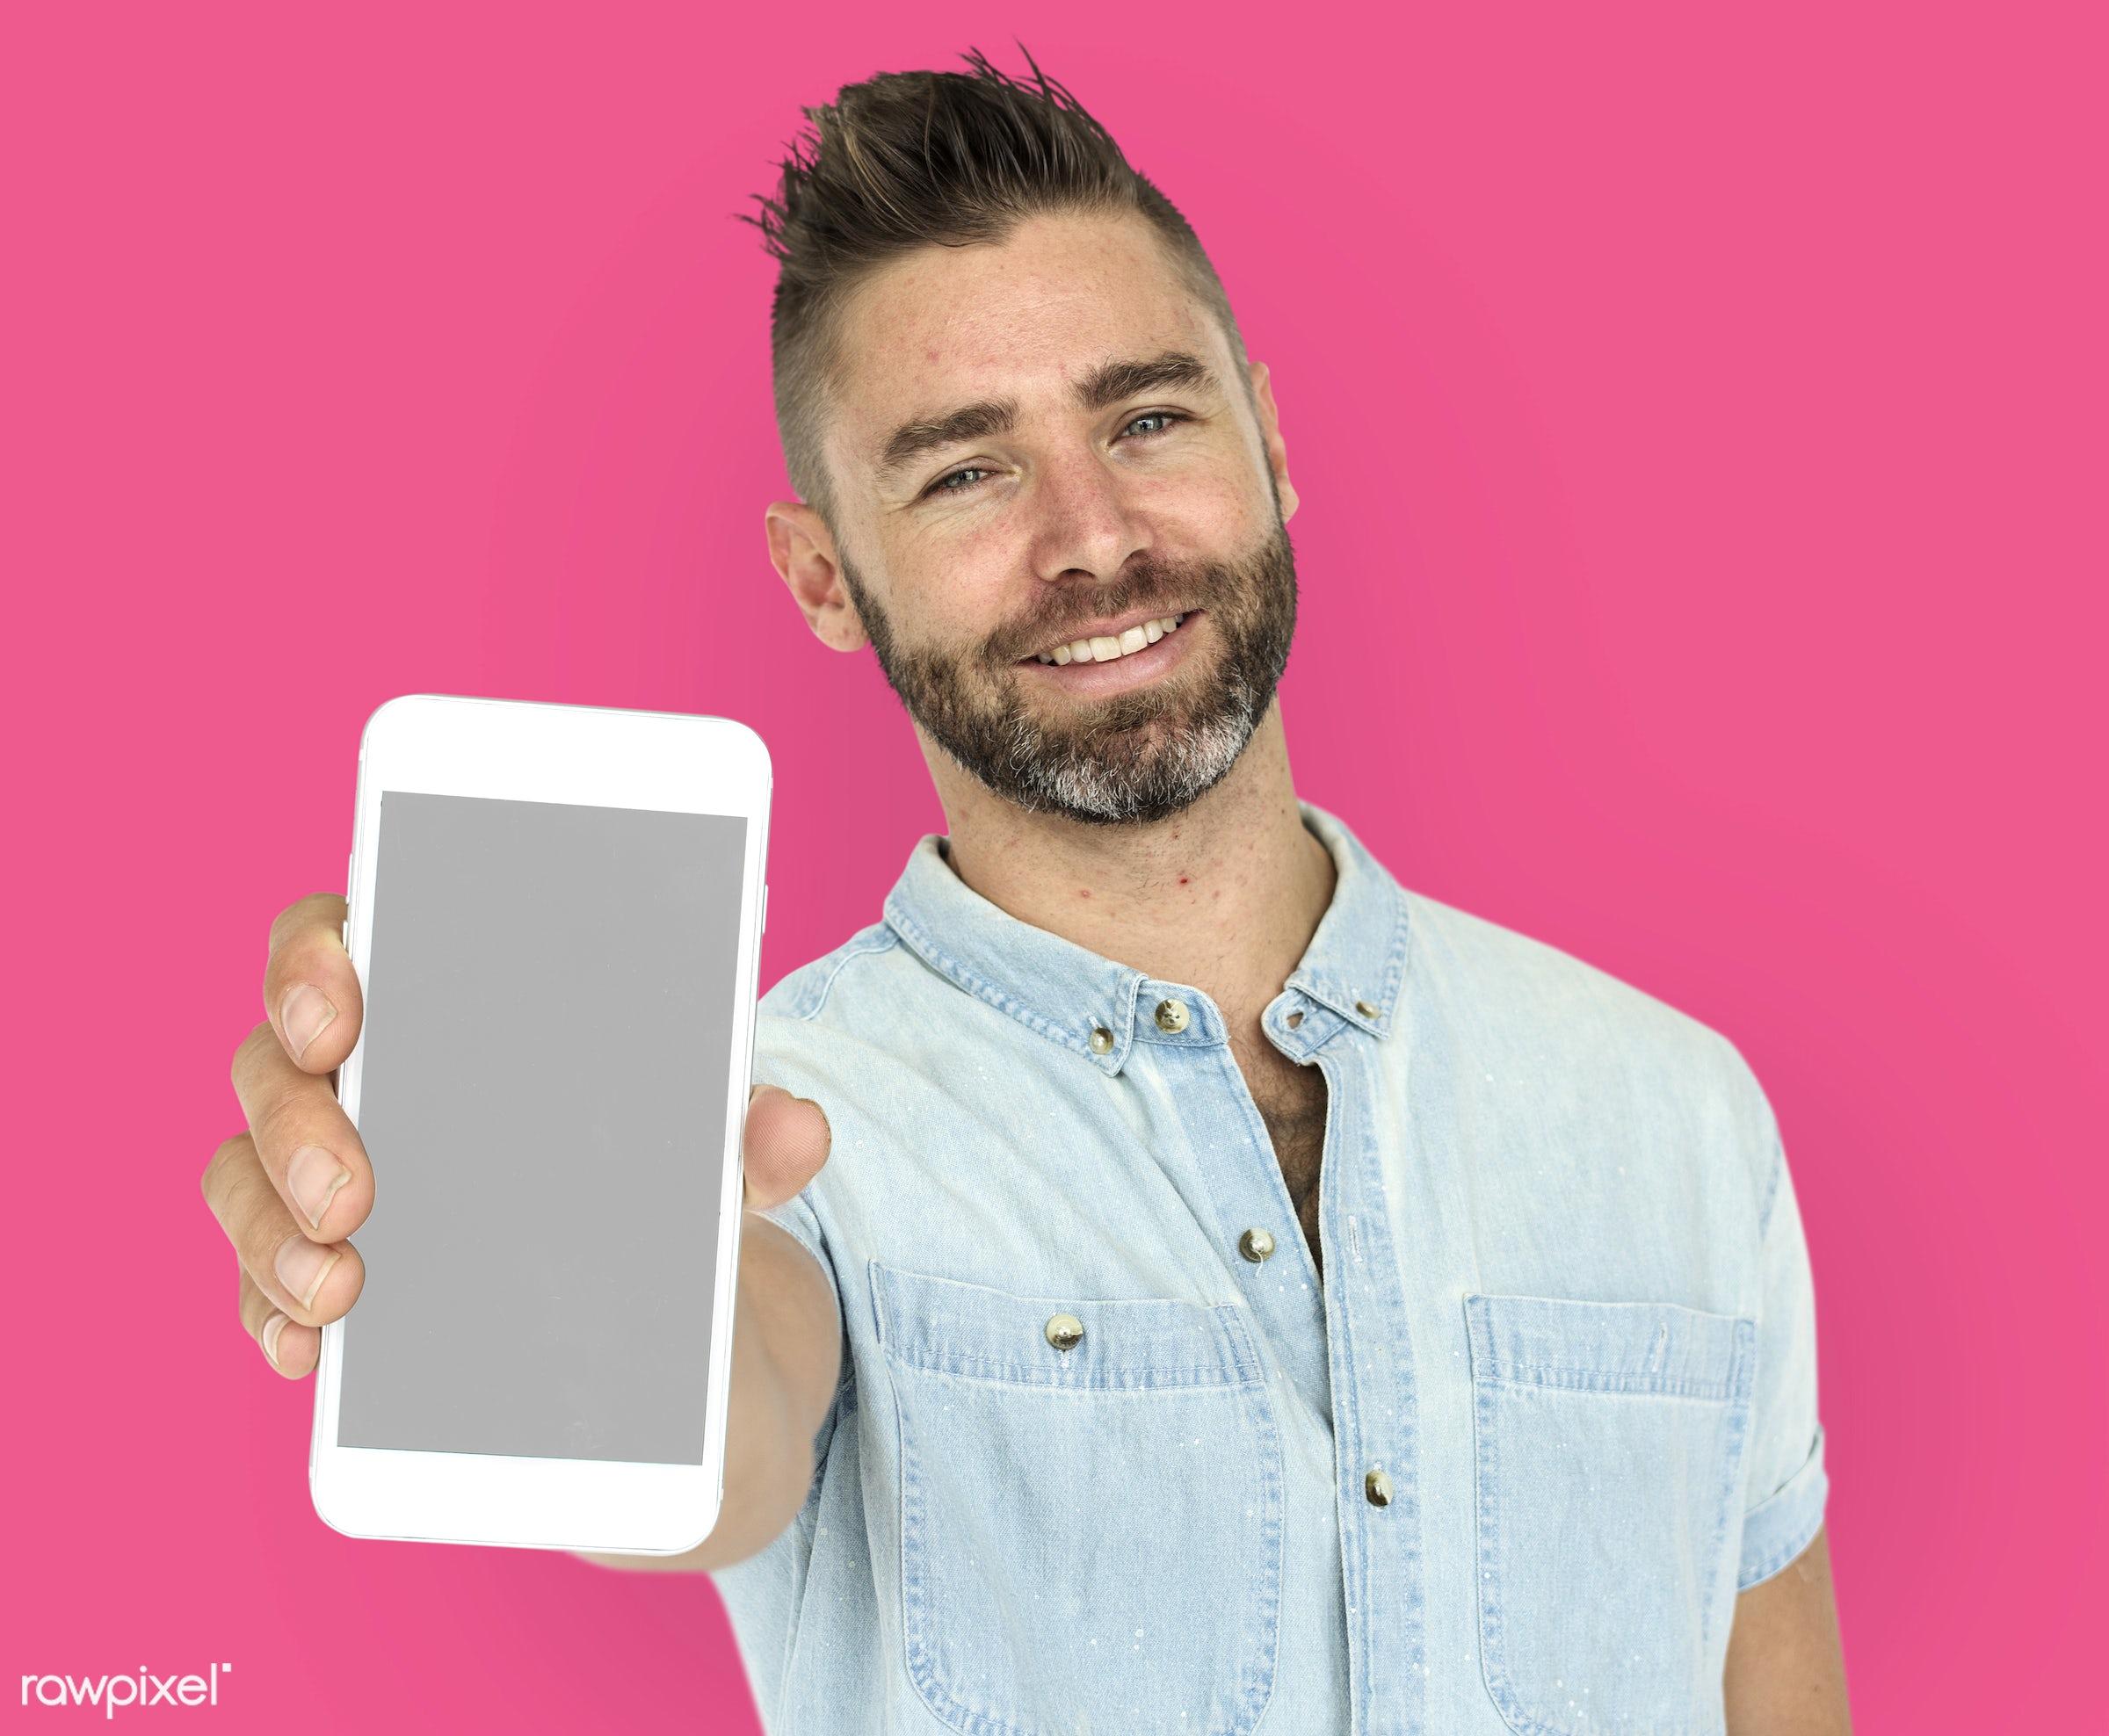 background, beard, caucasian, communication, device, emotion, expression, holding, holding phone, isolated, male, man,...